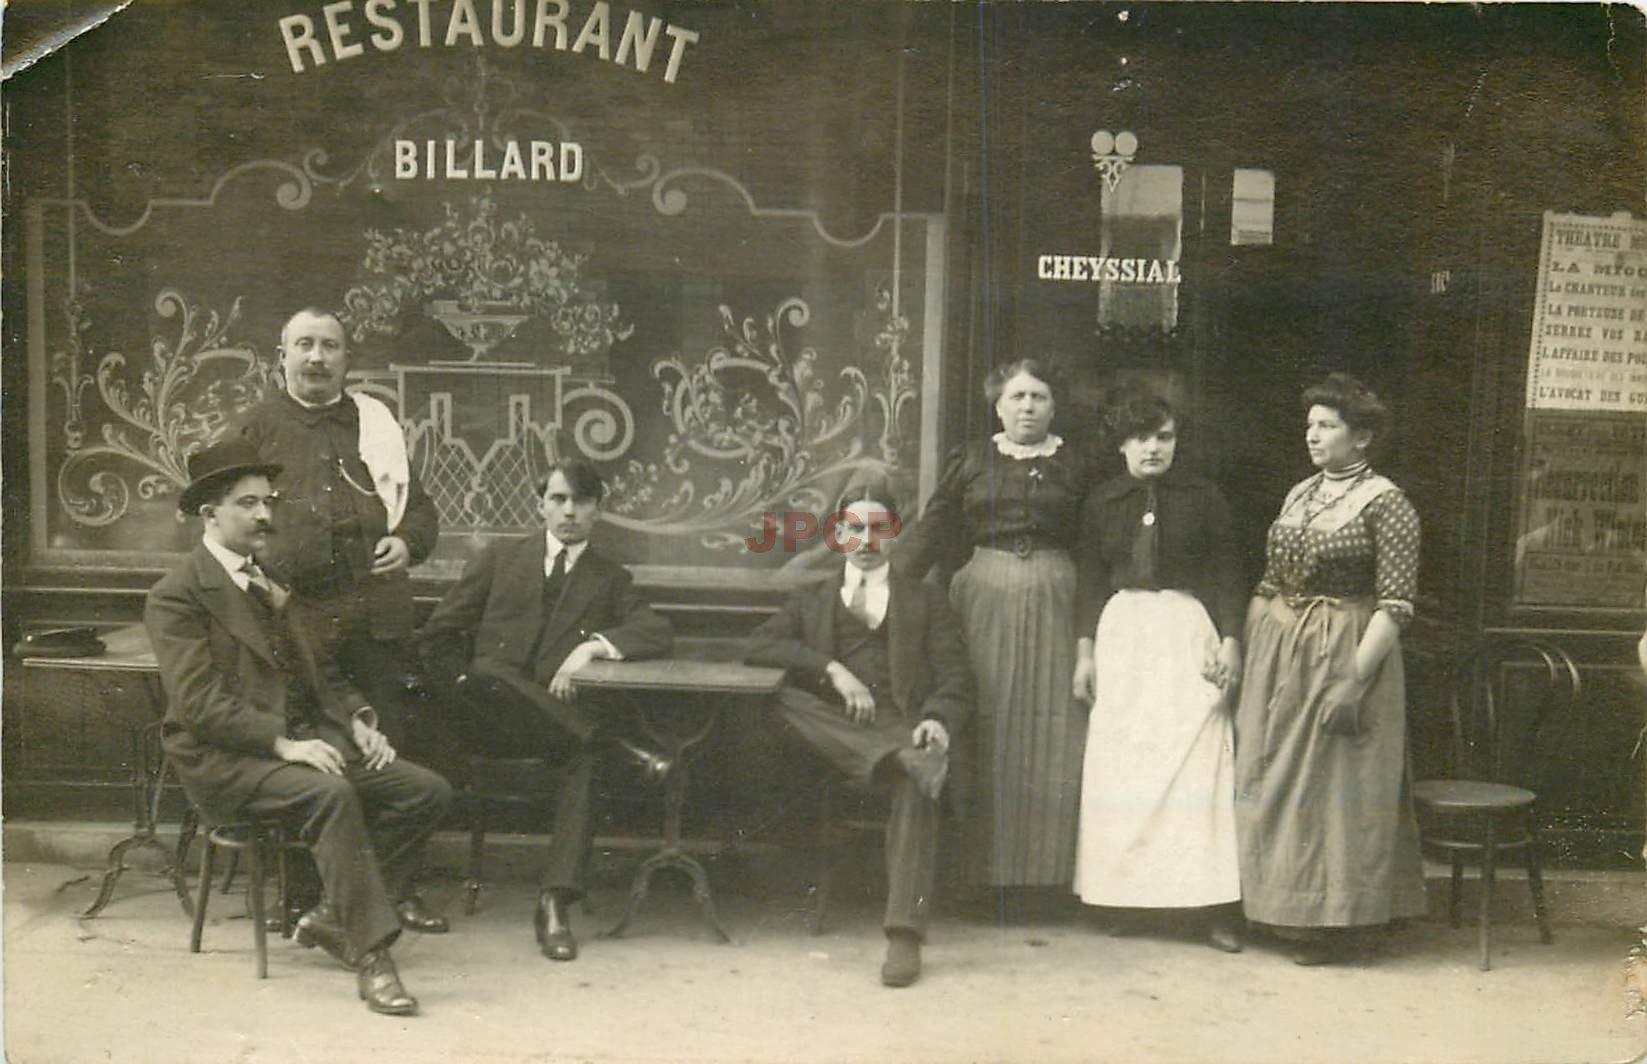 PARIS XVII. Maison Cheyssial Bar Restaurant 45 rue Pouchet. Photo carte postale rare